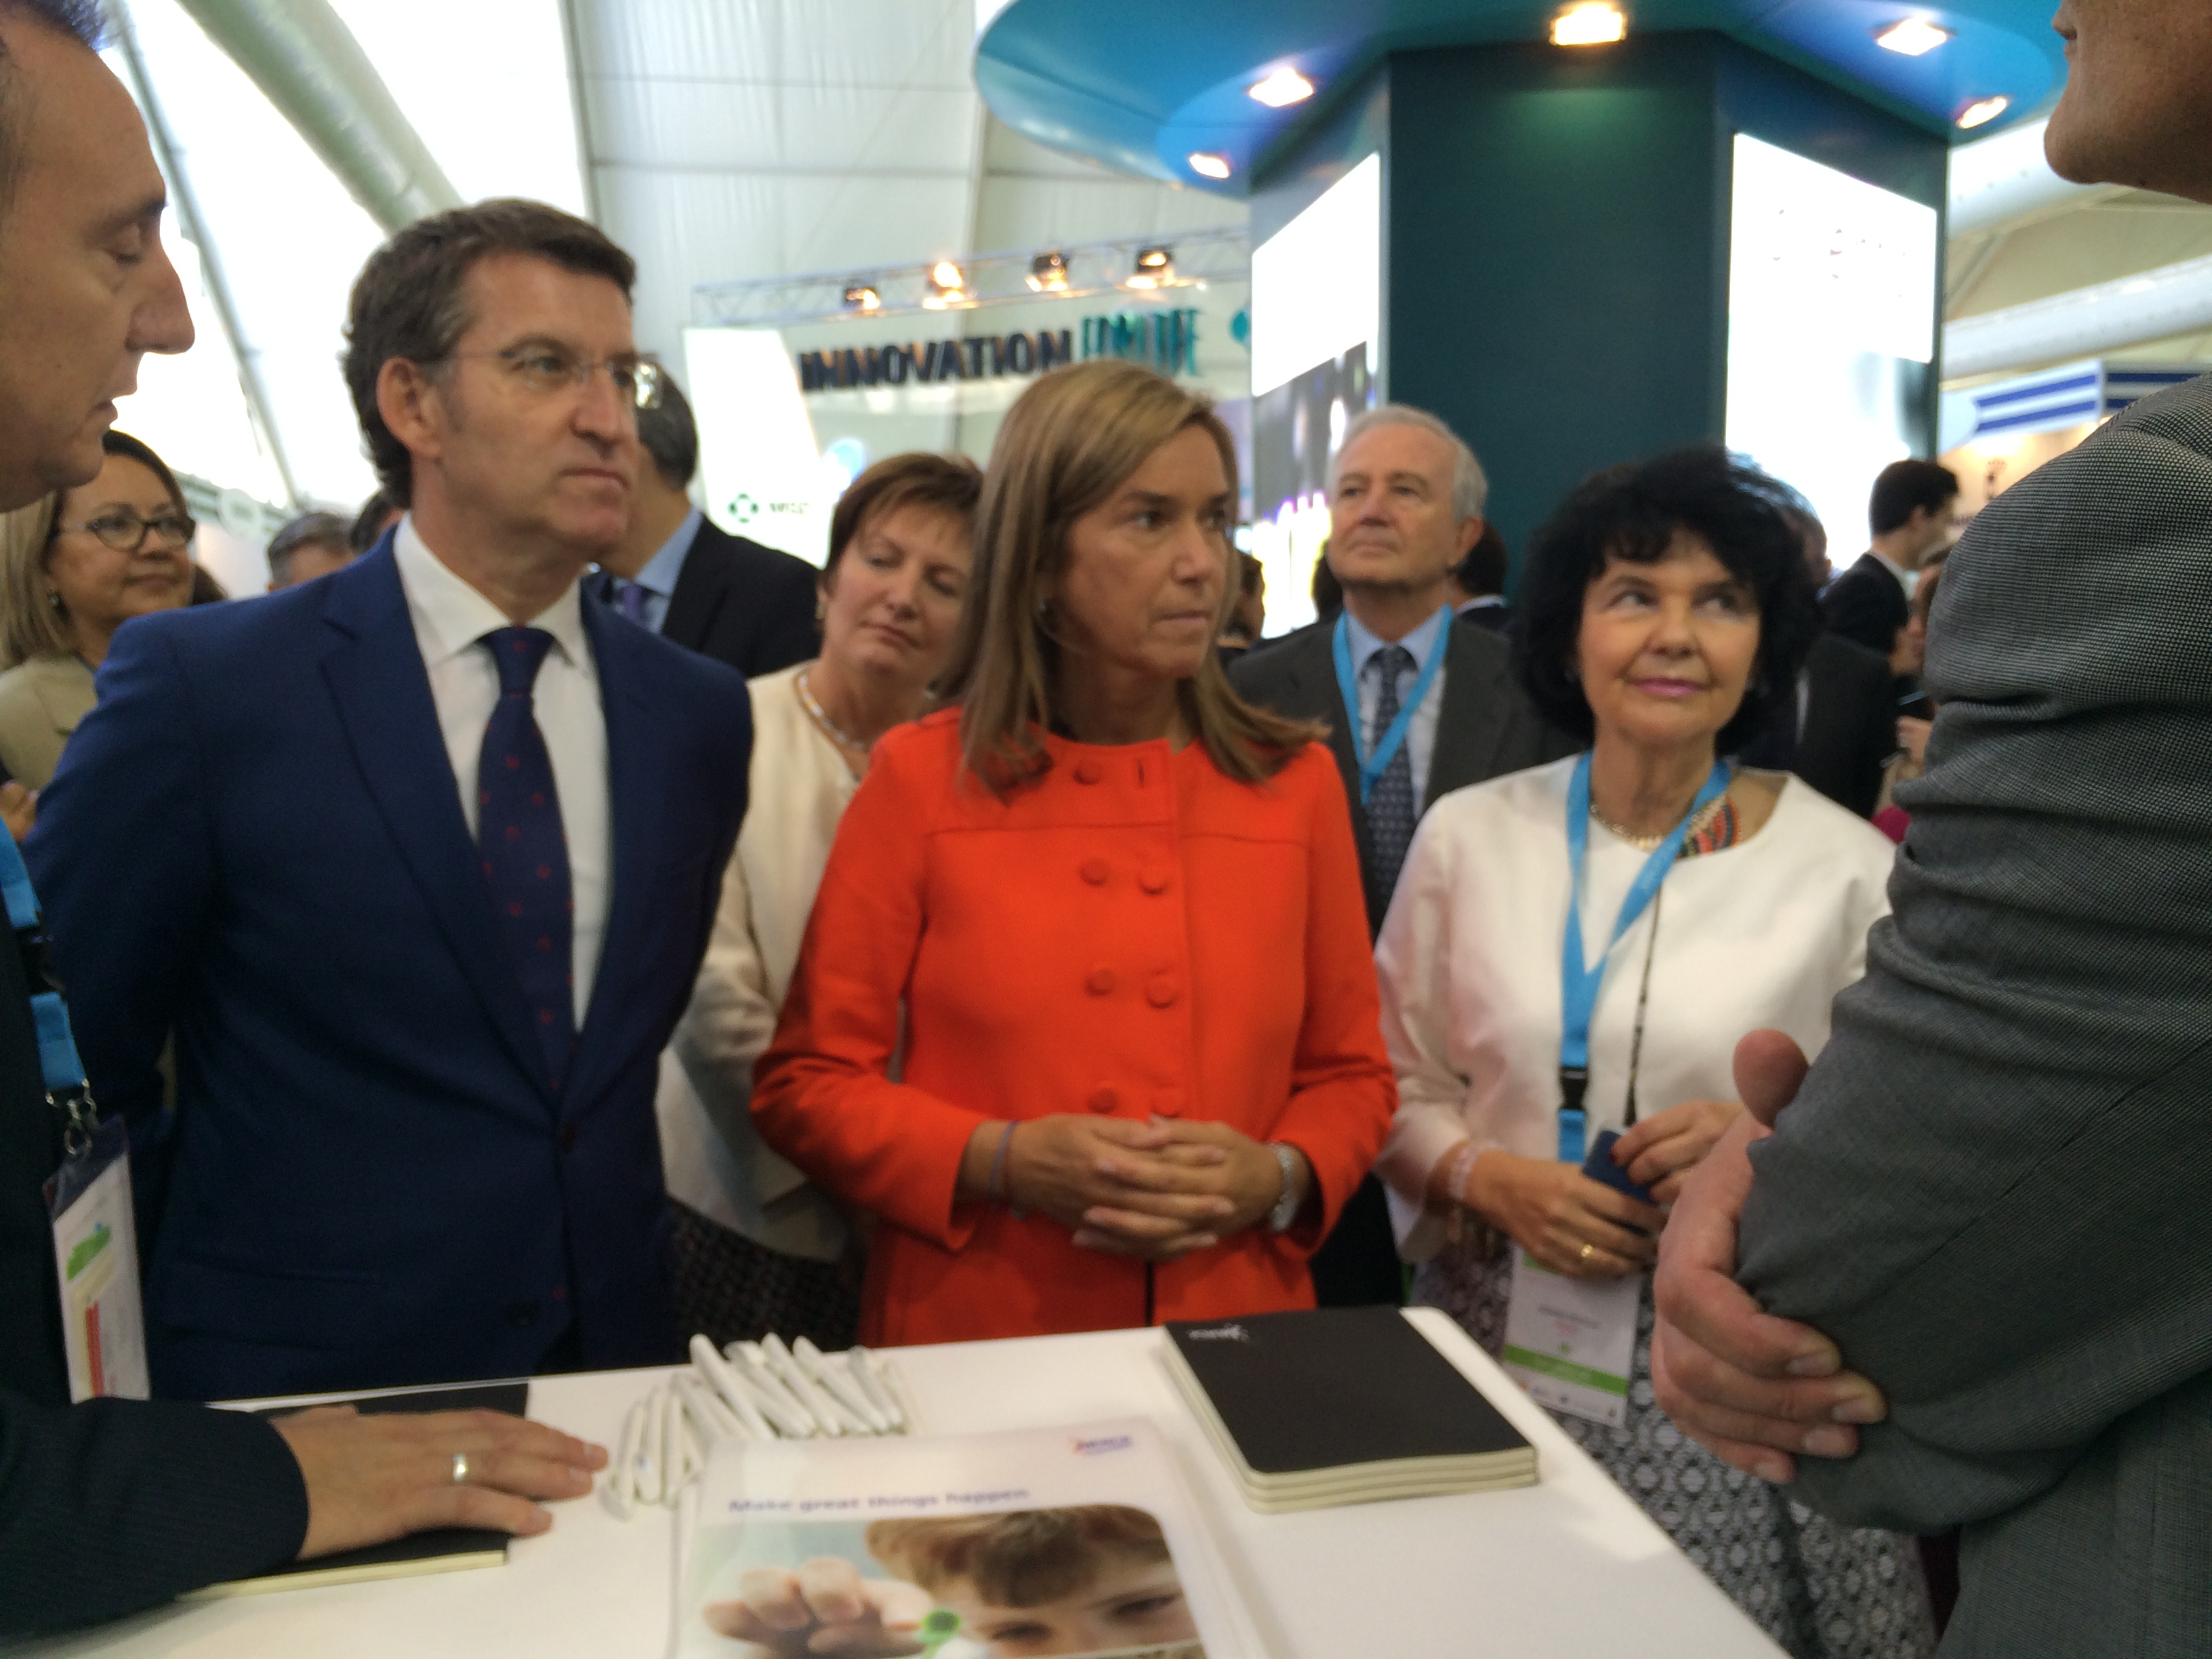 De izda. a dcha.: Alberto Núñez Feijó, Presidente de la Xunta de Galicia; Ana Mato, Ministra de Sanidad, y Regina Revilla, Presidenta de ASEBIO